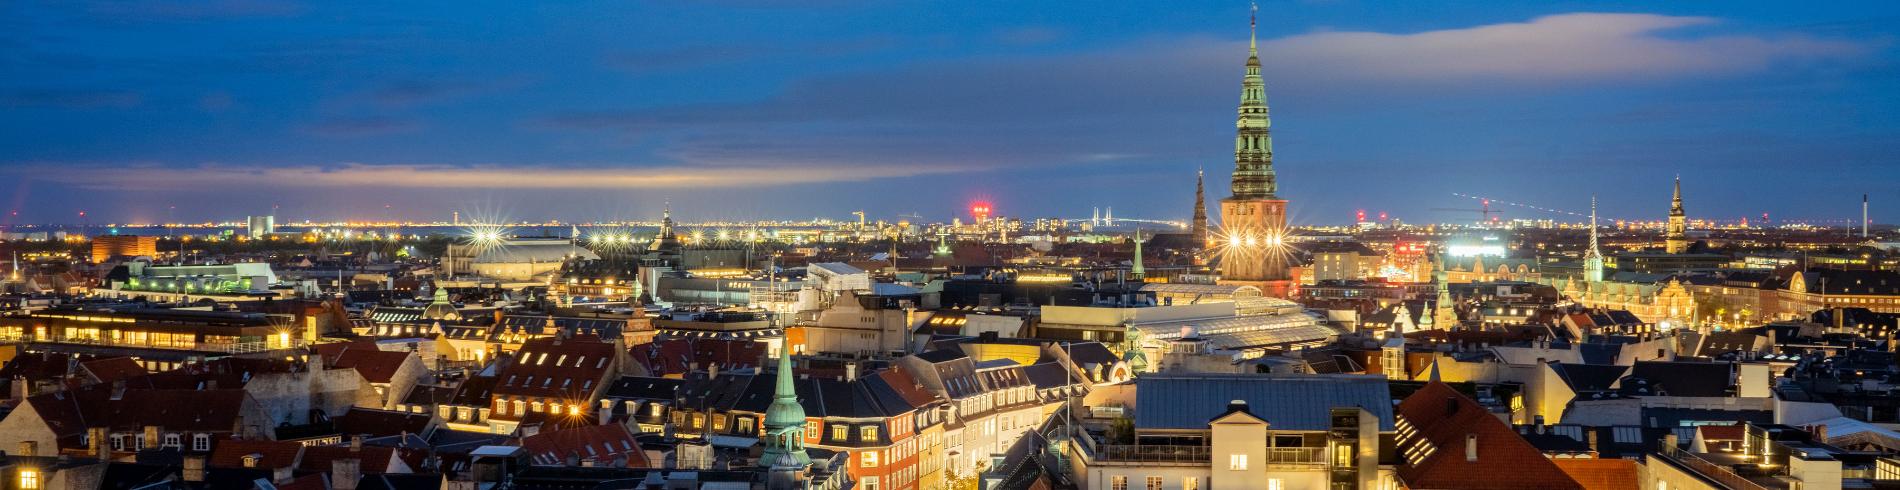 Copenhagen Media Center cover image